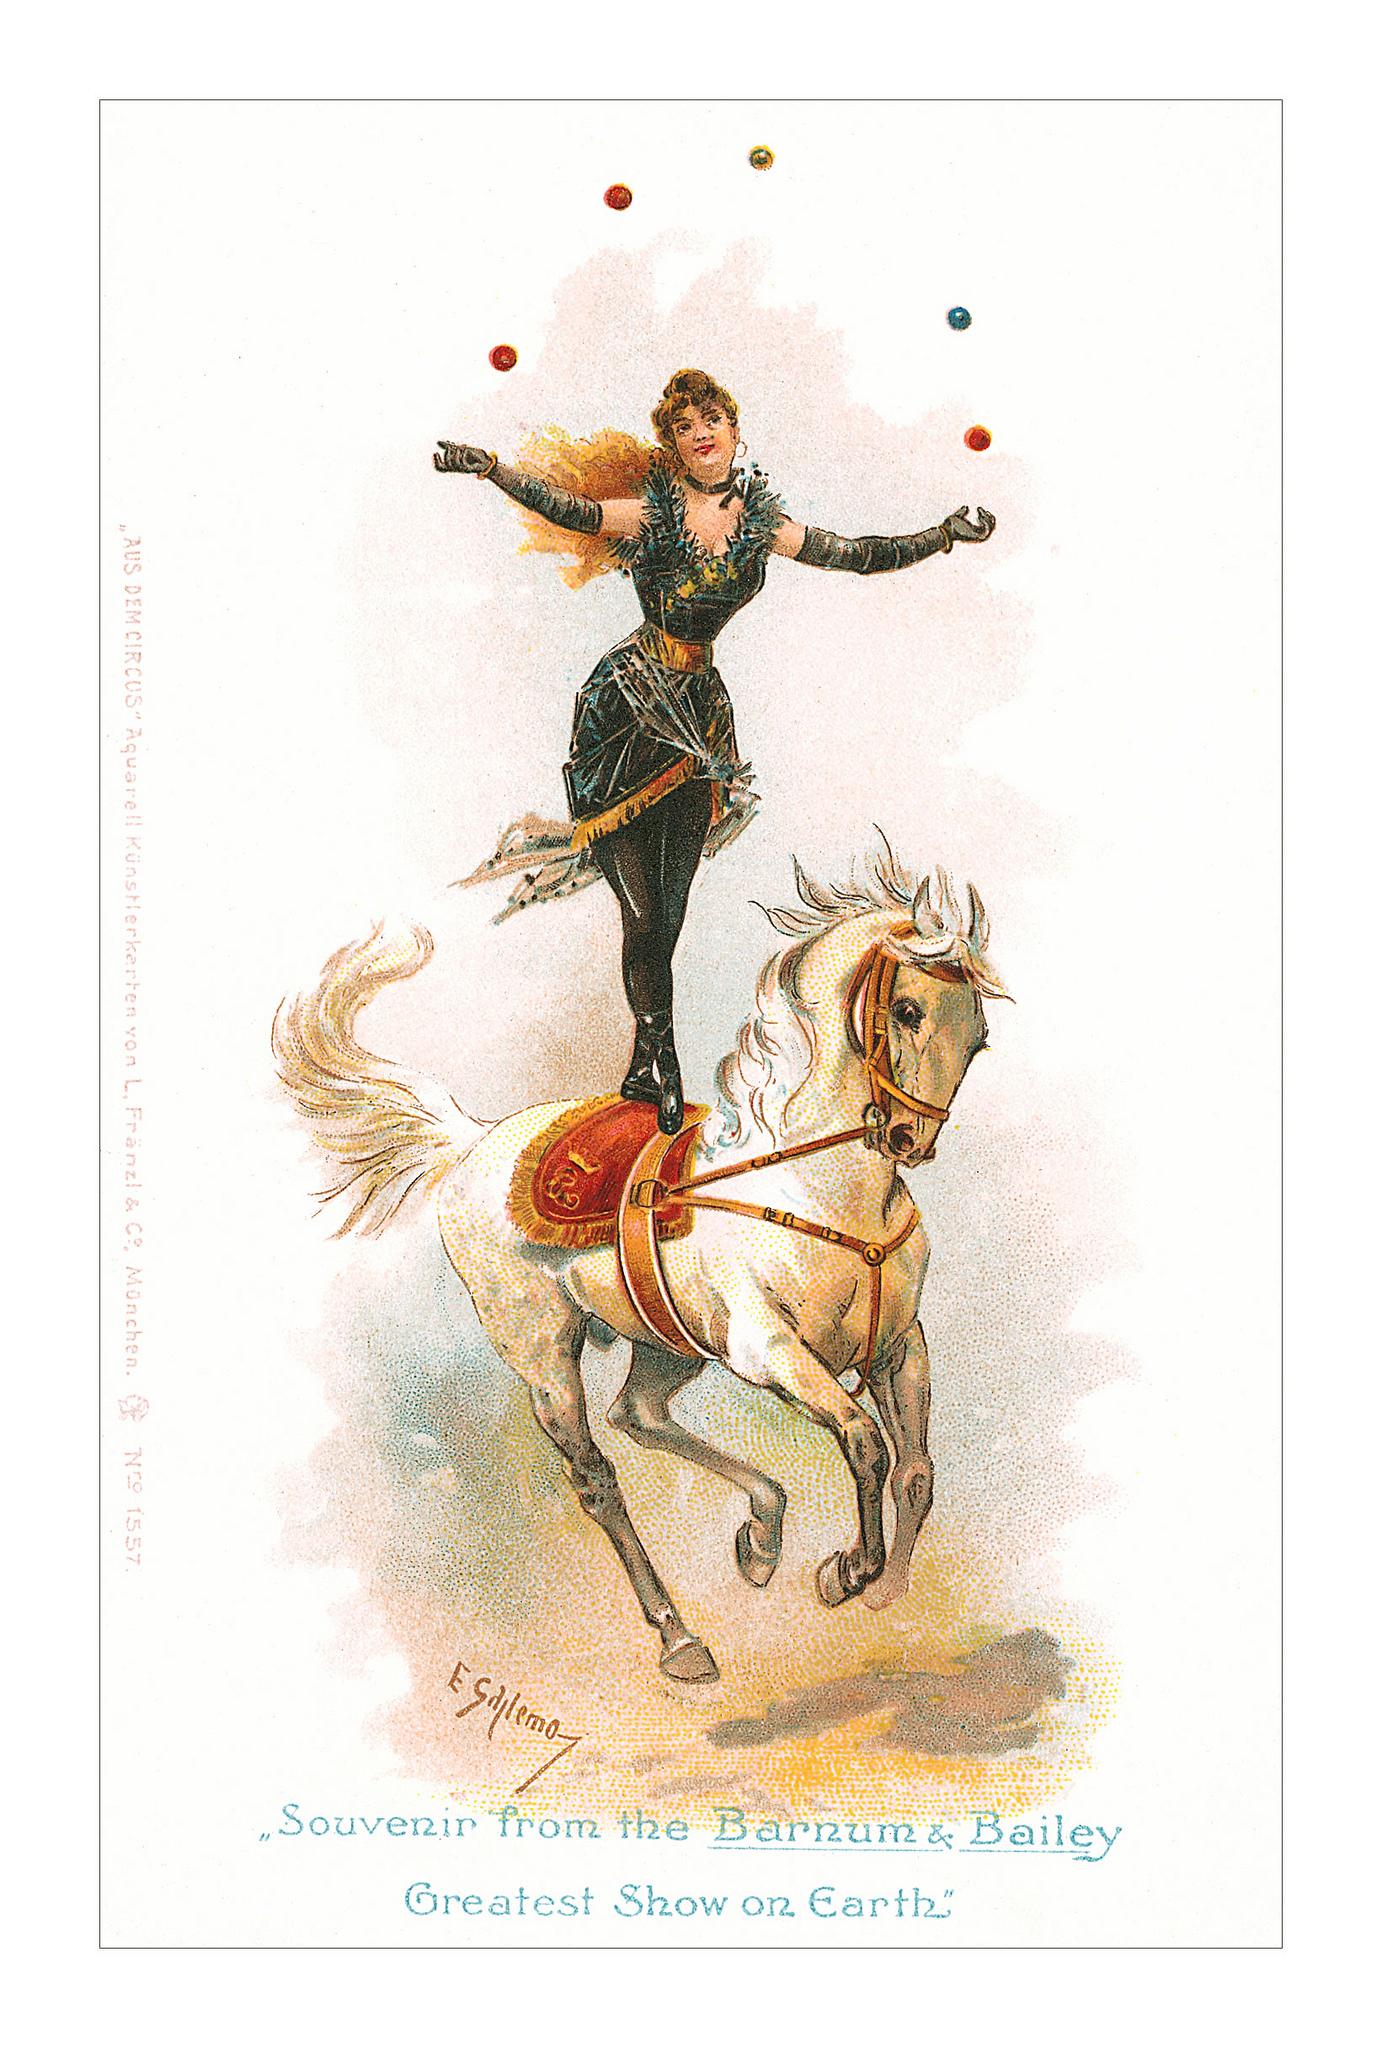 Barnum freelance juggler